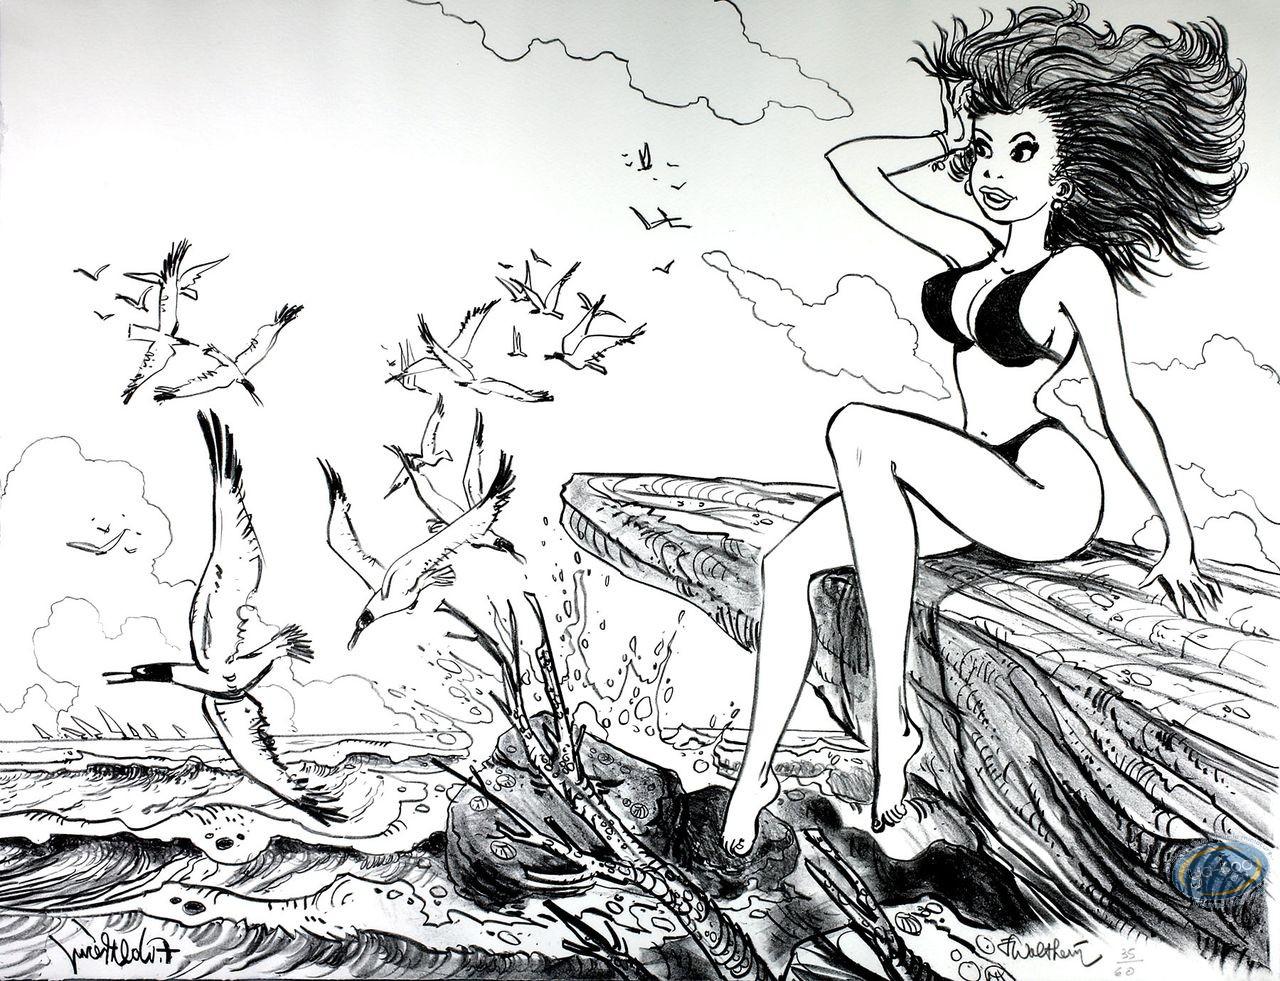 Lithography, Natacha : Natacha at the Sea with Seagulls